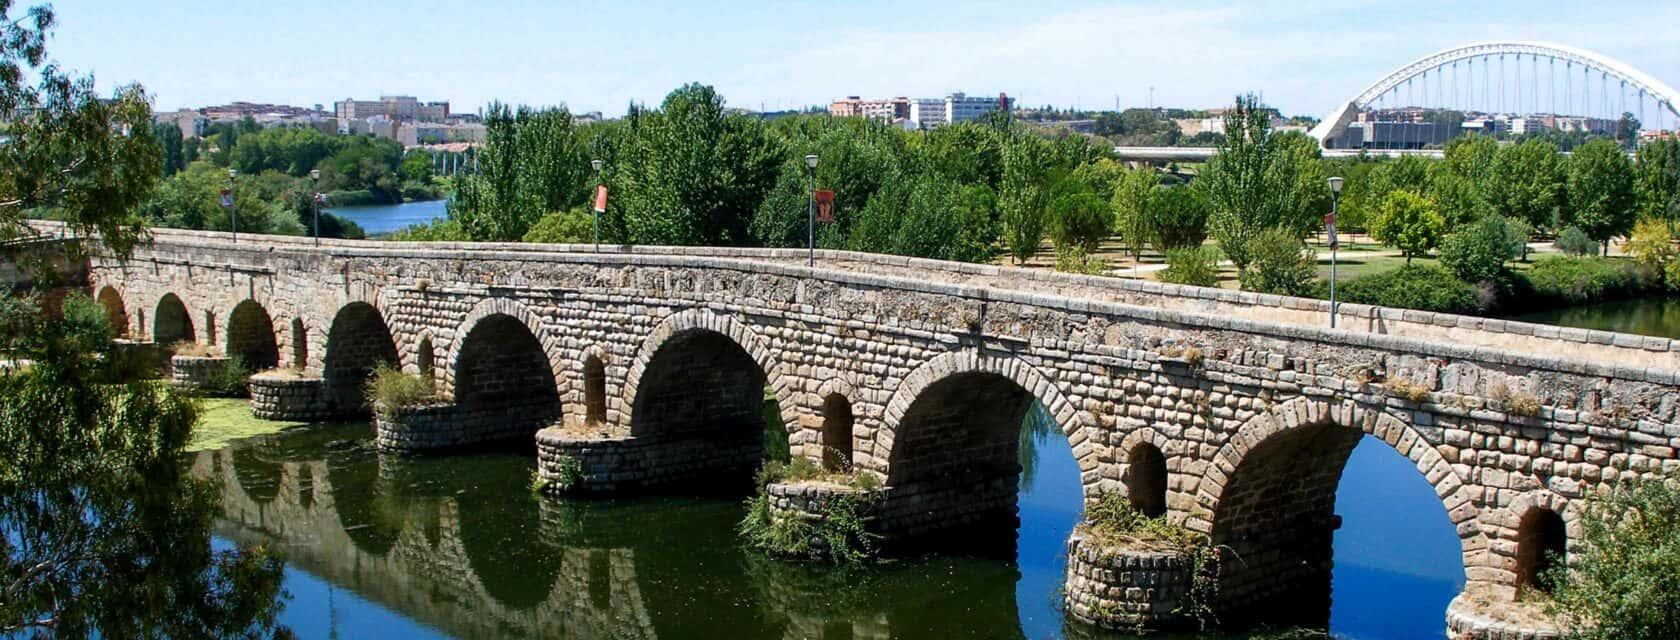 Aqueducts in the city of Merida.